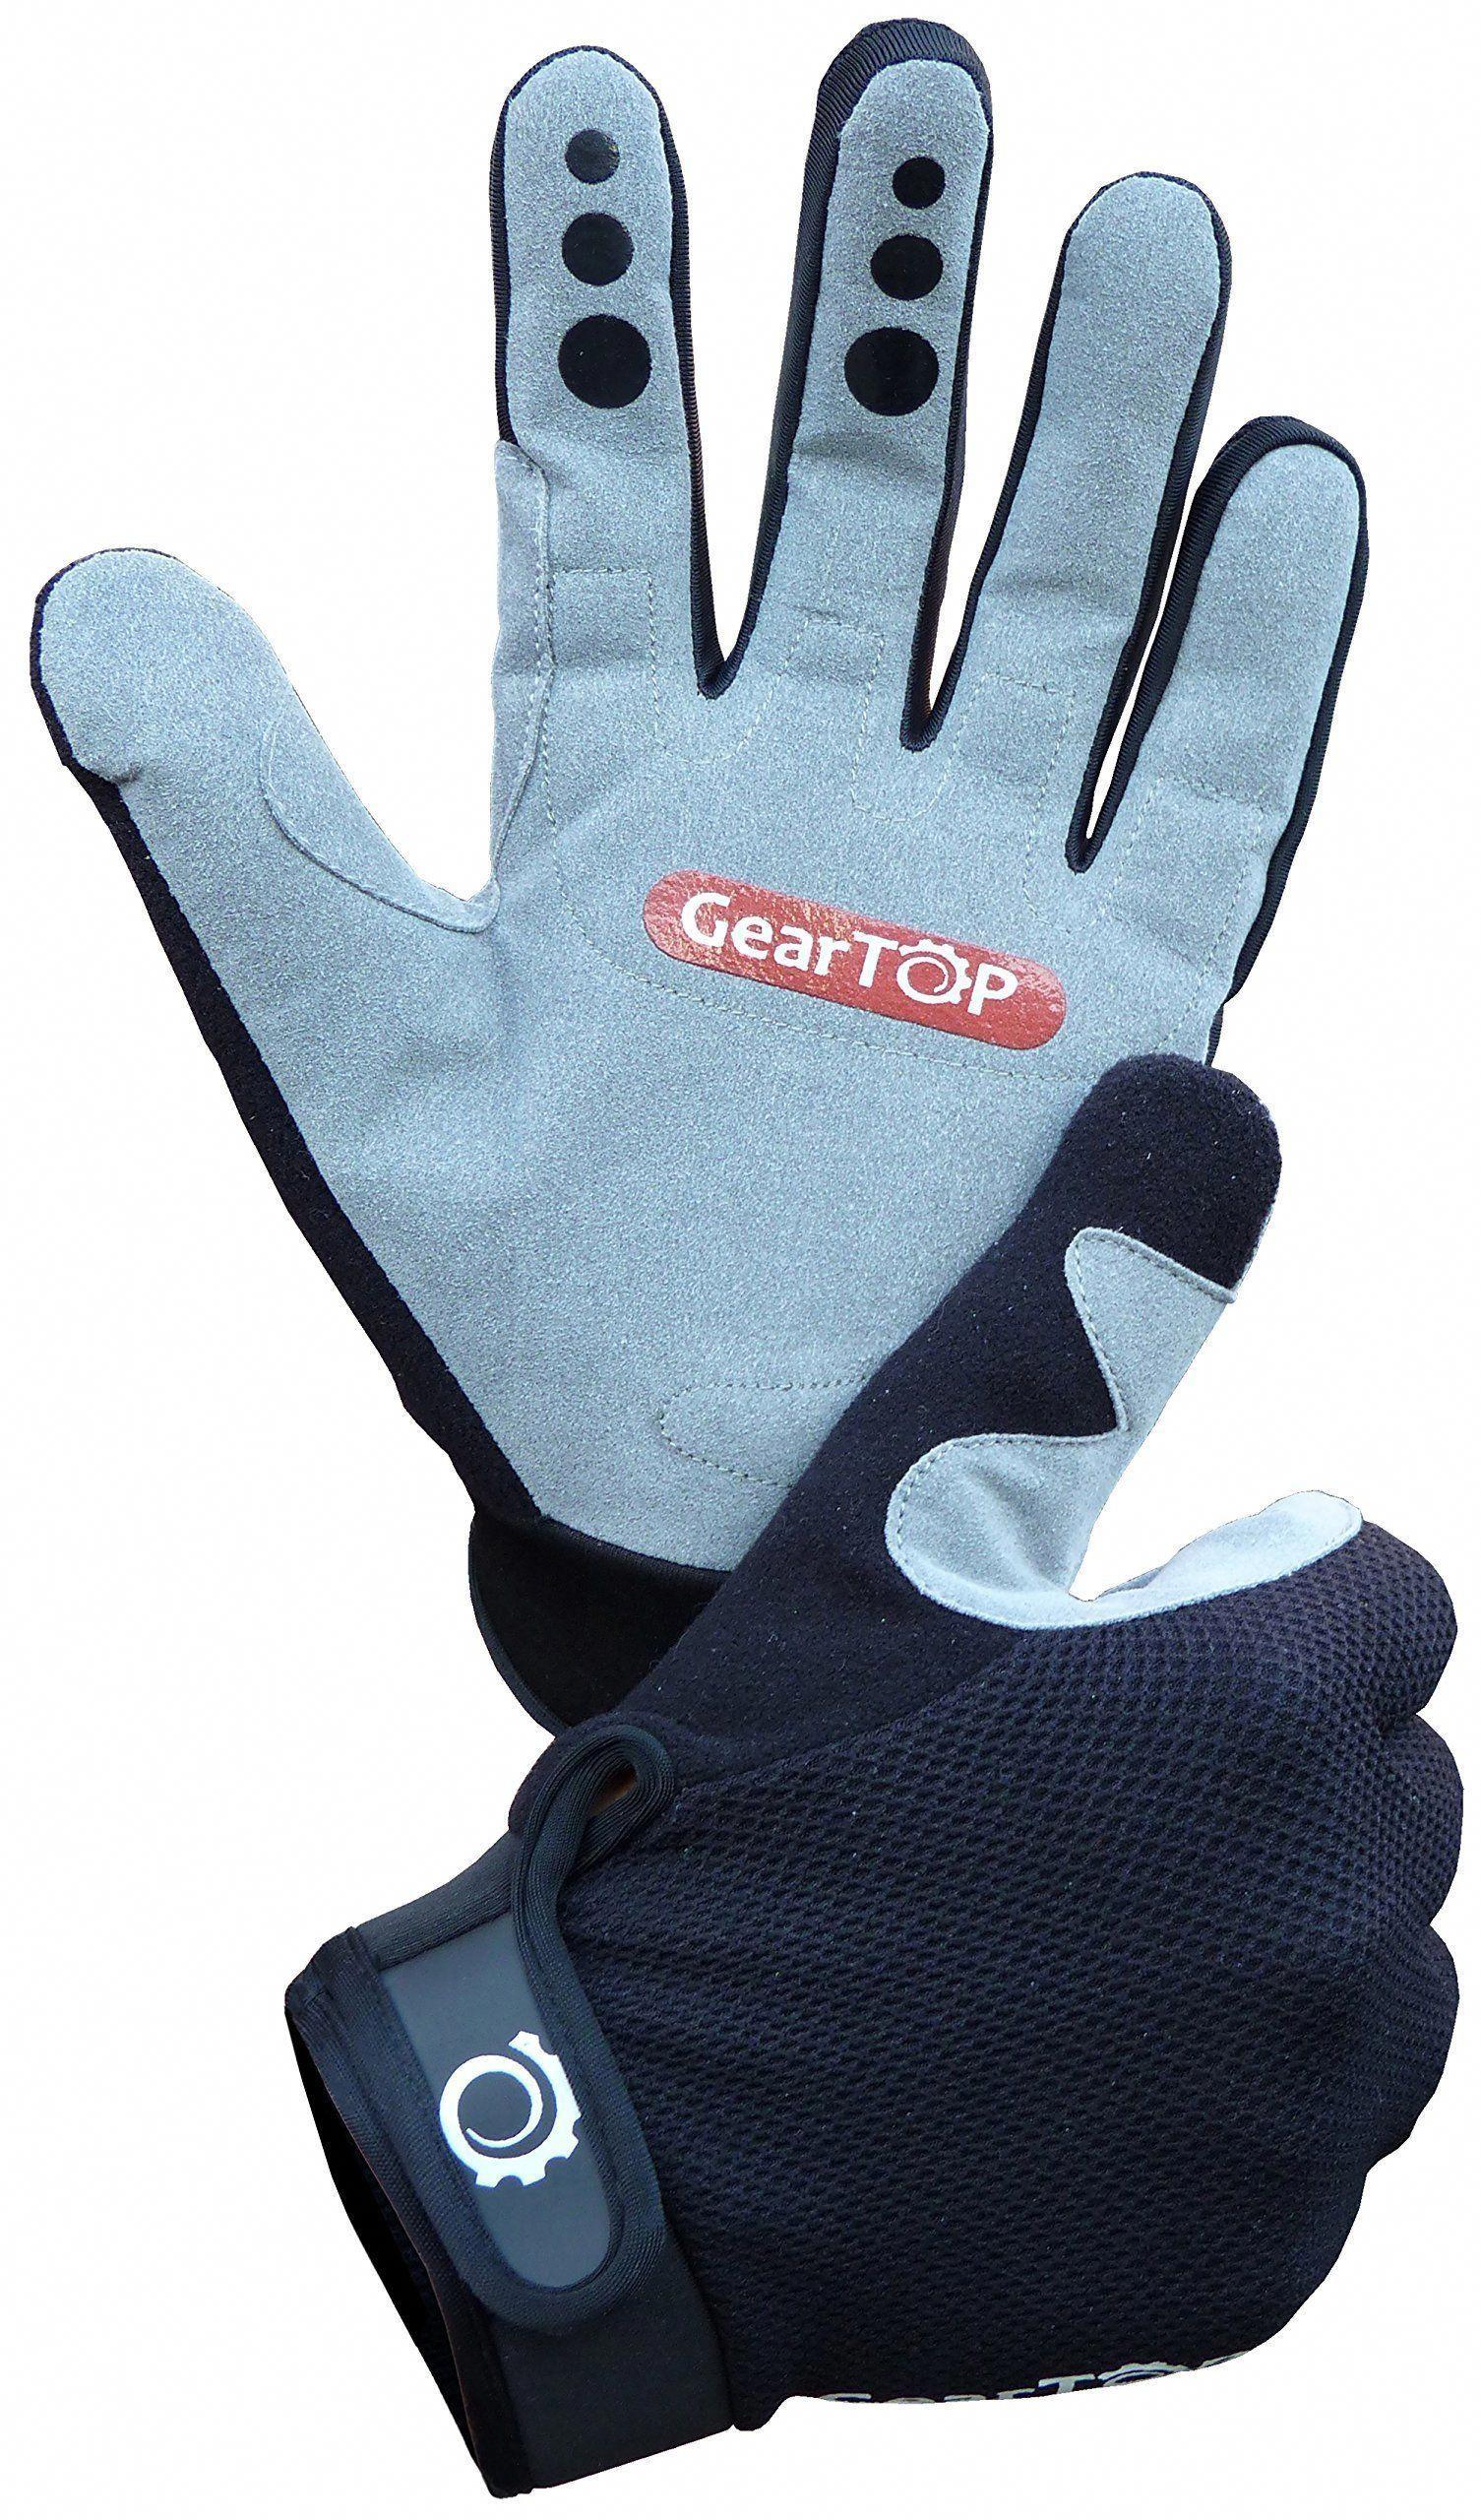 Mountain Biking Gloves Bundle Great For Cycling Performance